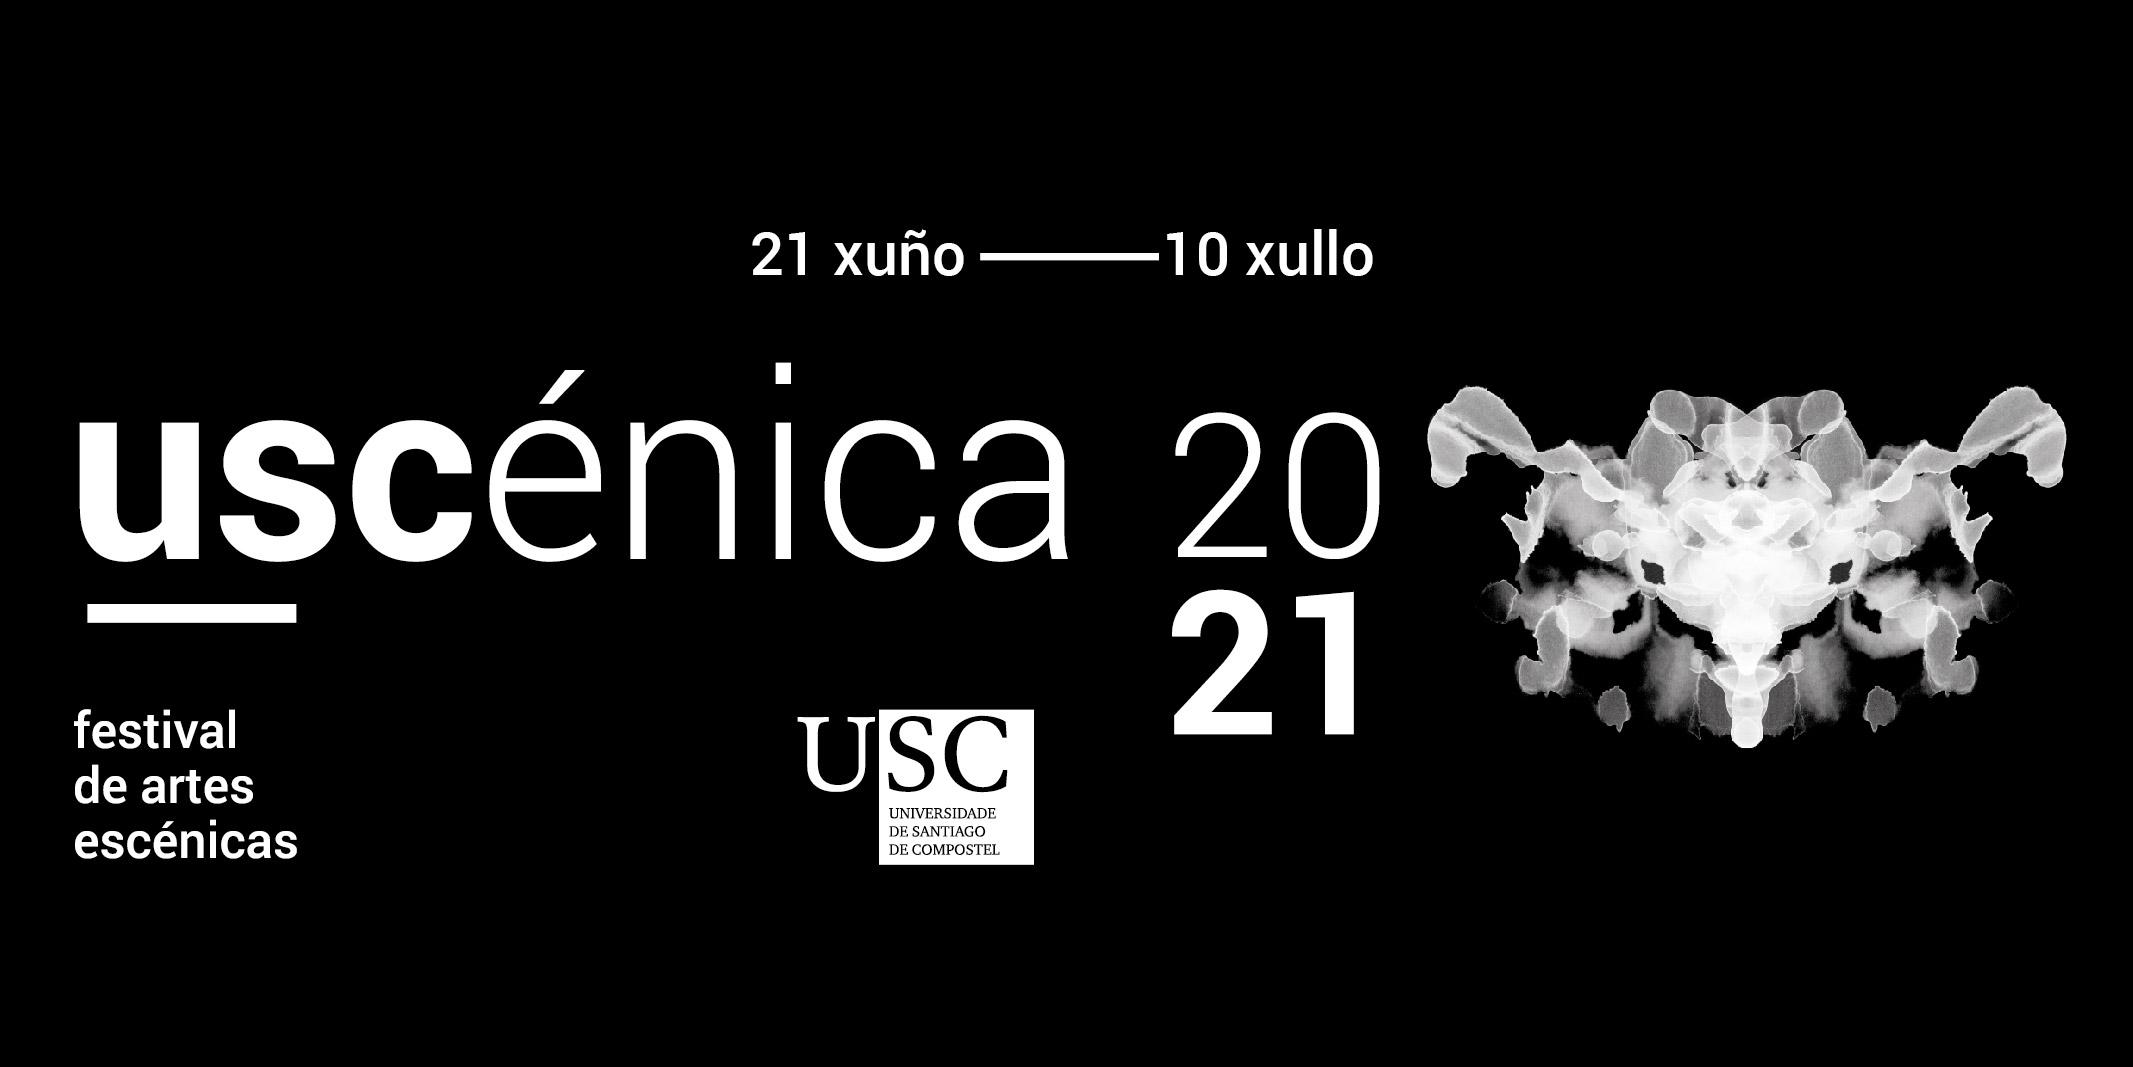 USCénica